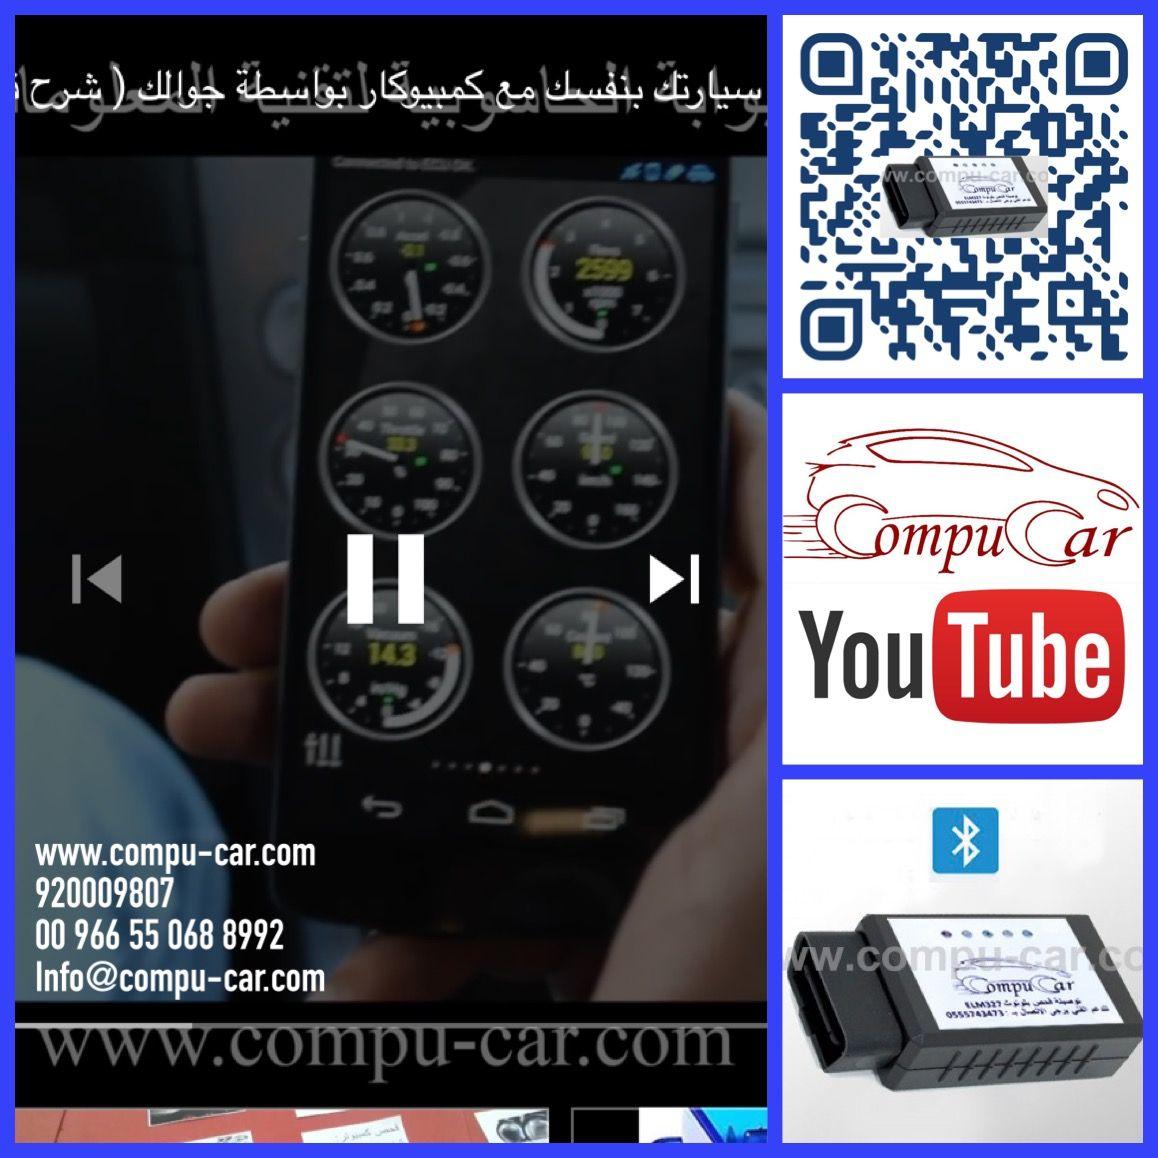 Obd Elm توصيلة فحص بلوتوث لفحص كومبيوتر المحرك واستخراج الأعطال عن طريق الهاتف الجوال Mobile Connector For Diagnostic Car Via Bluetooth Info Gear Stick